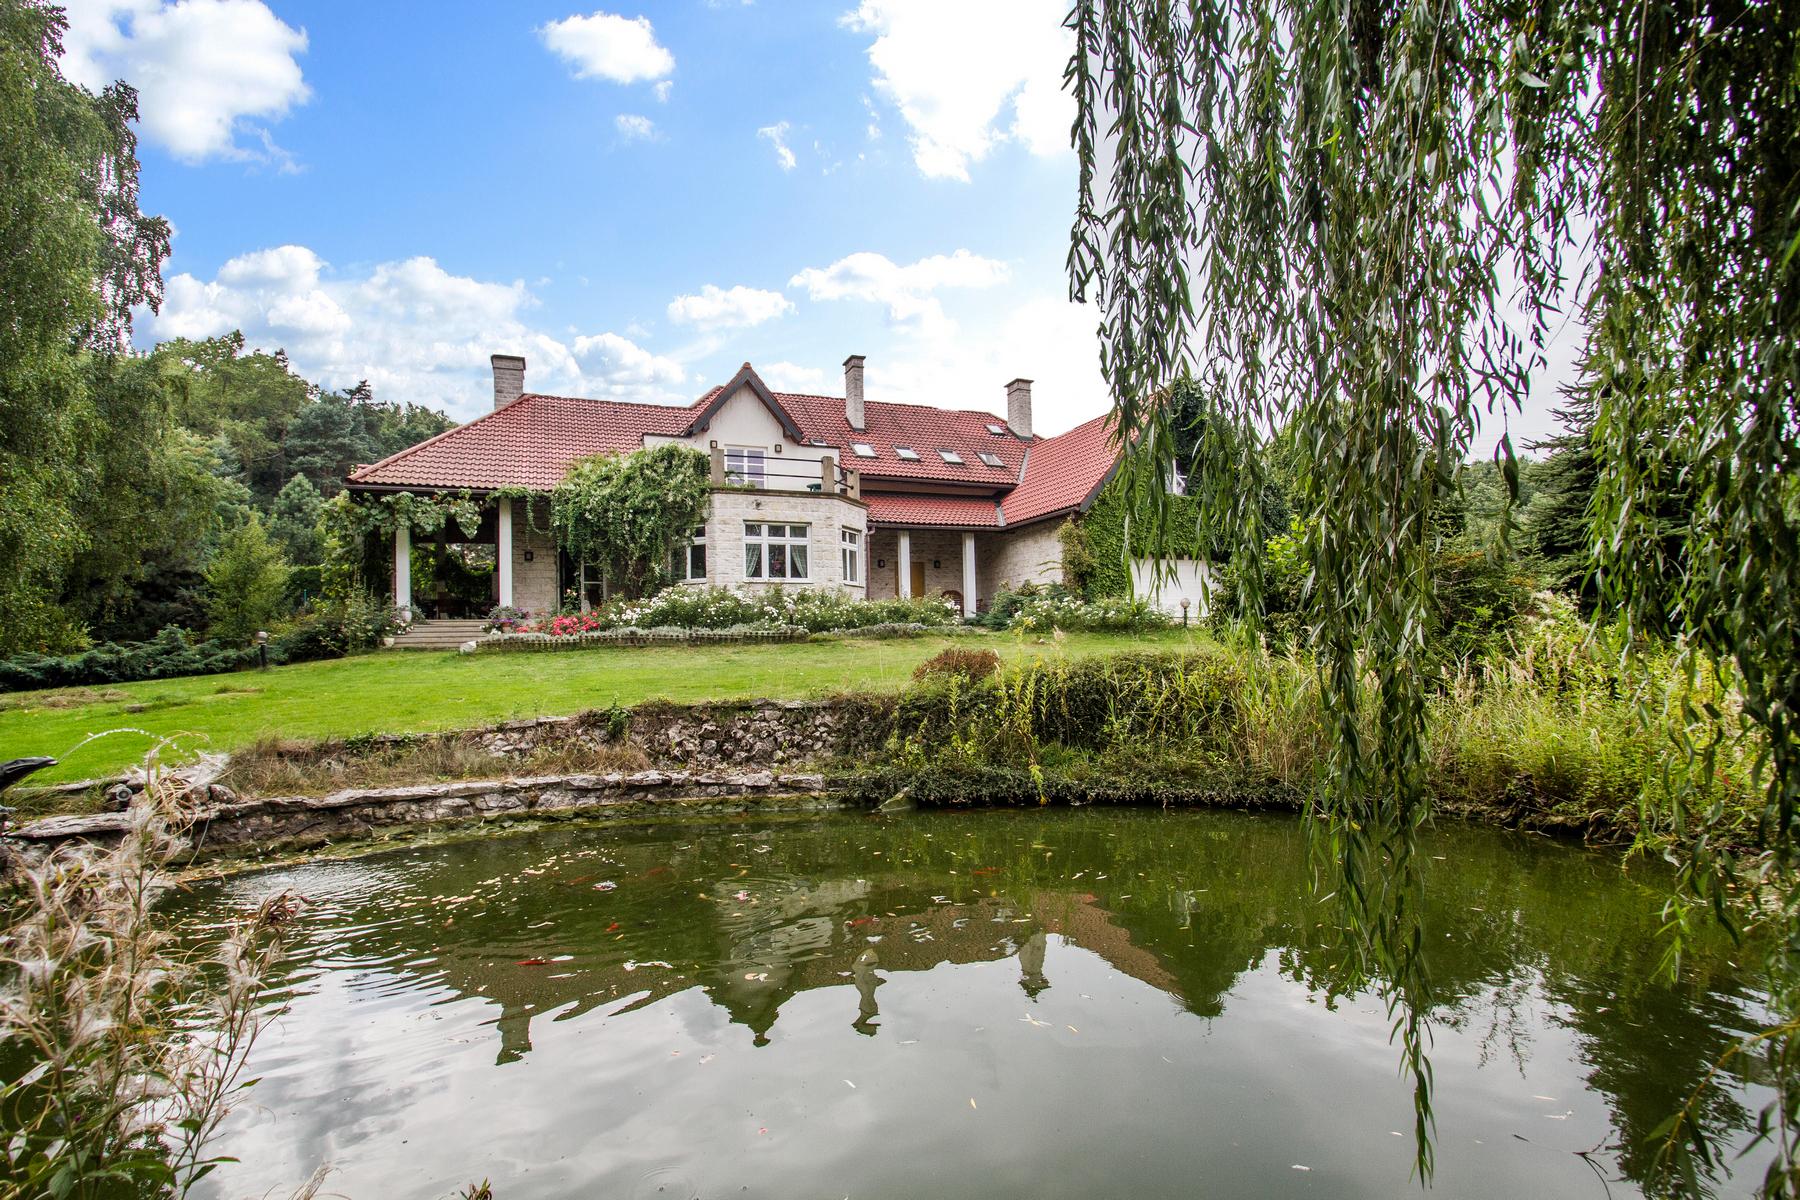 Single Family Home for Sale at Kraków Dębniki - Podgórki Tynieckie Cracow, Malopolska, Poland